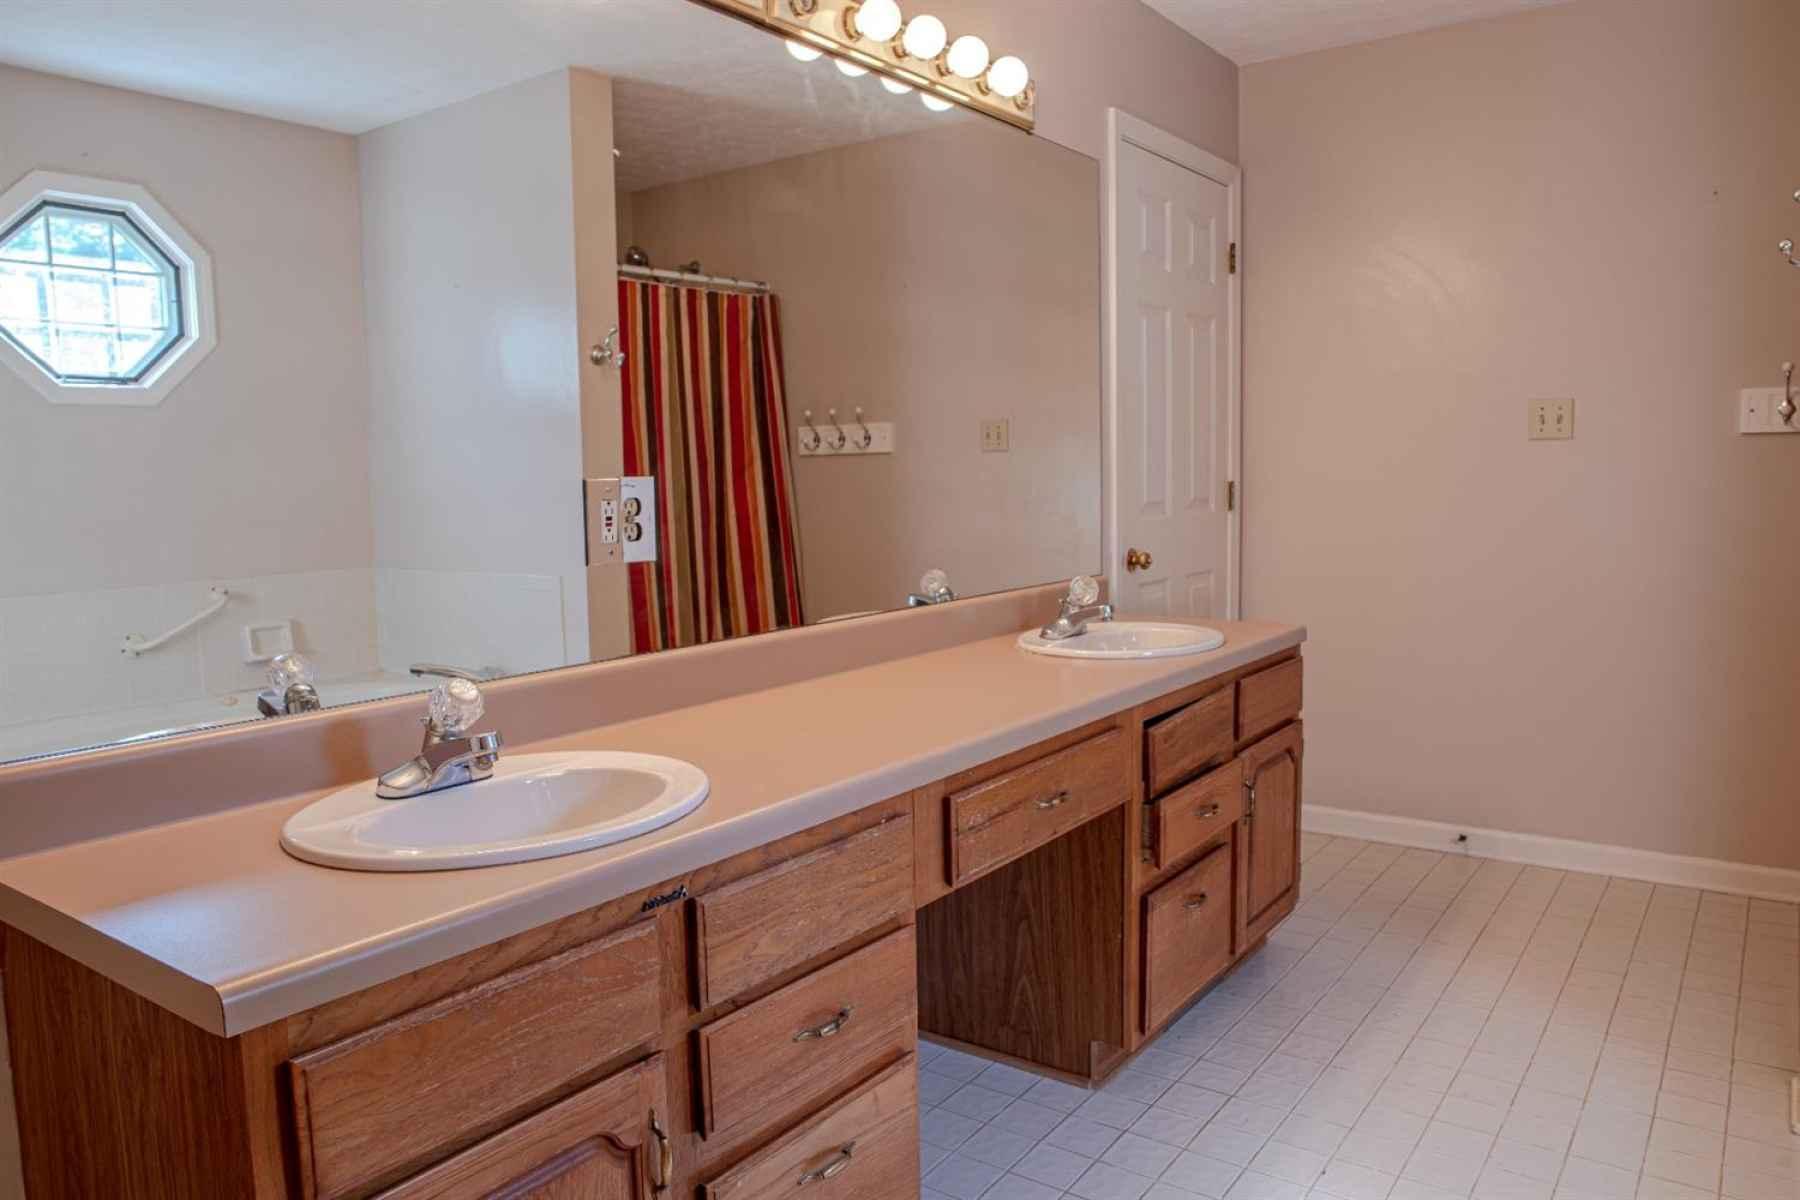 Double Vanities in This Large Bathroom